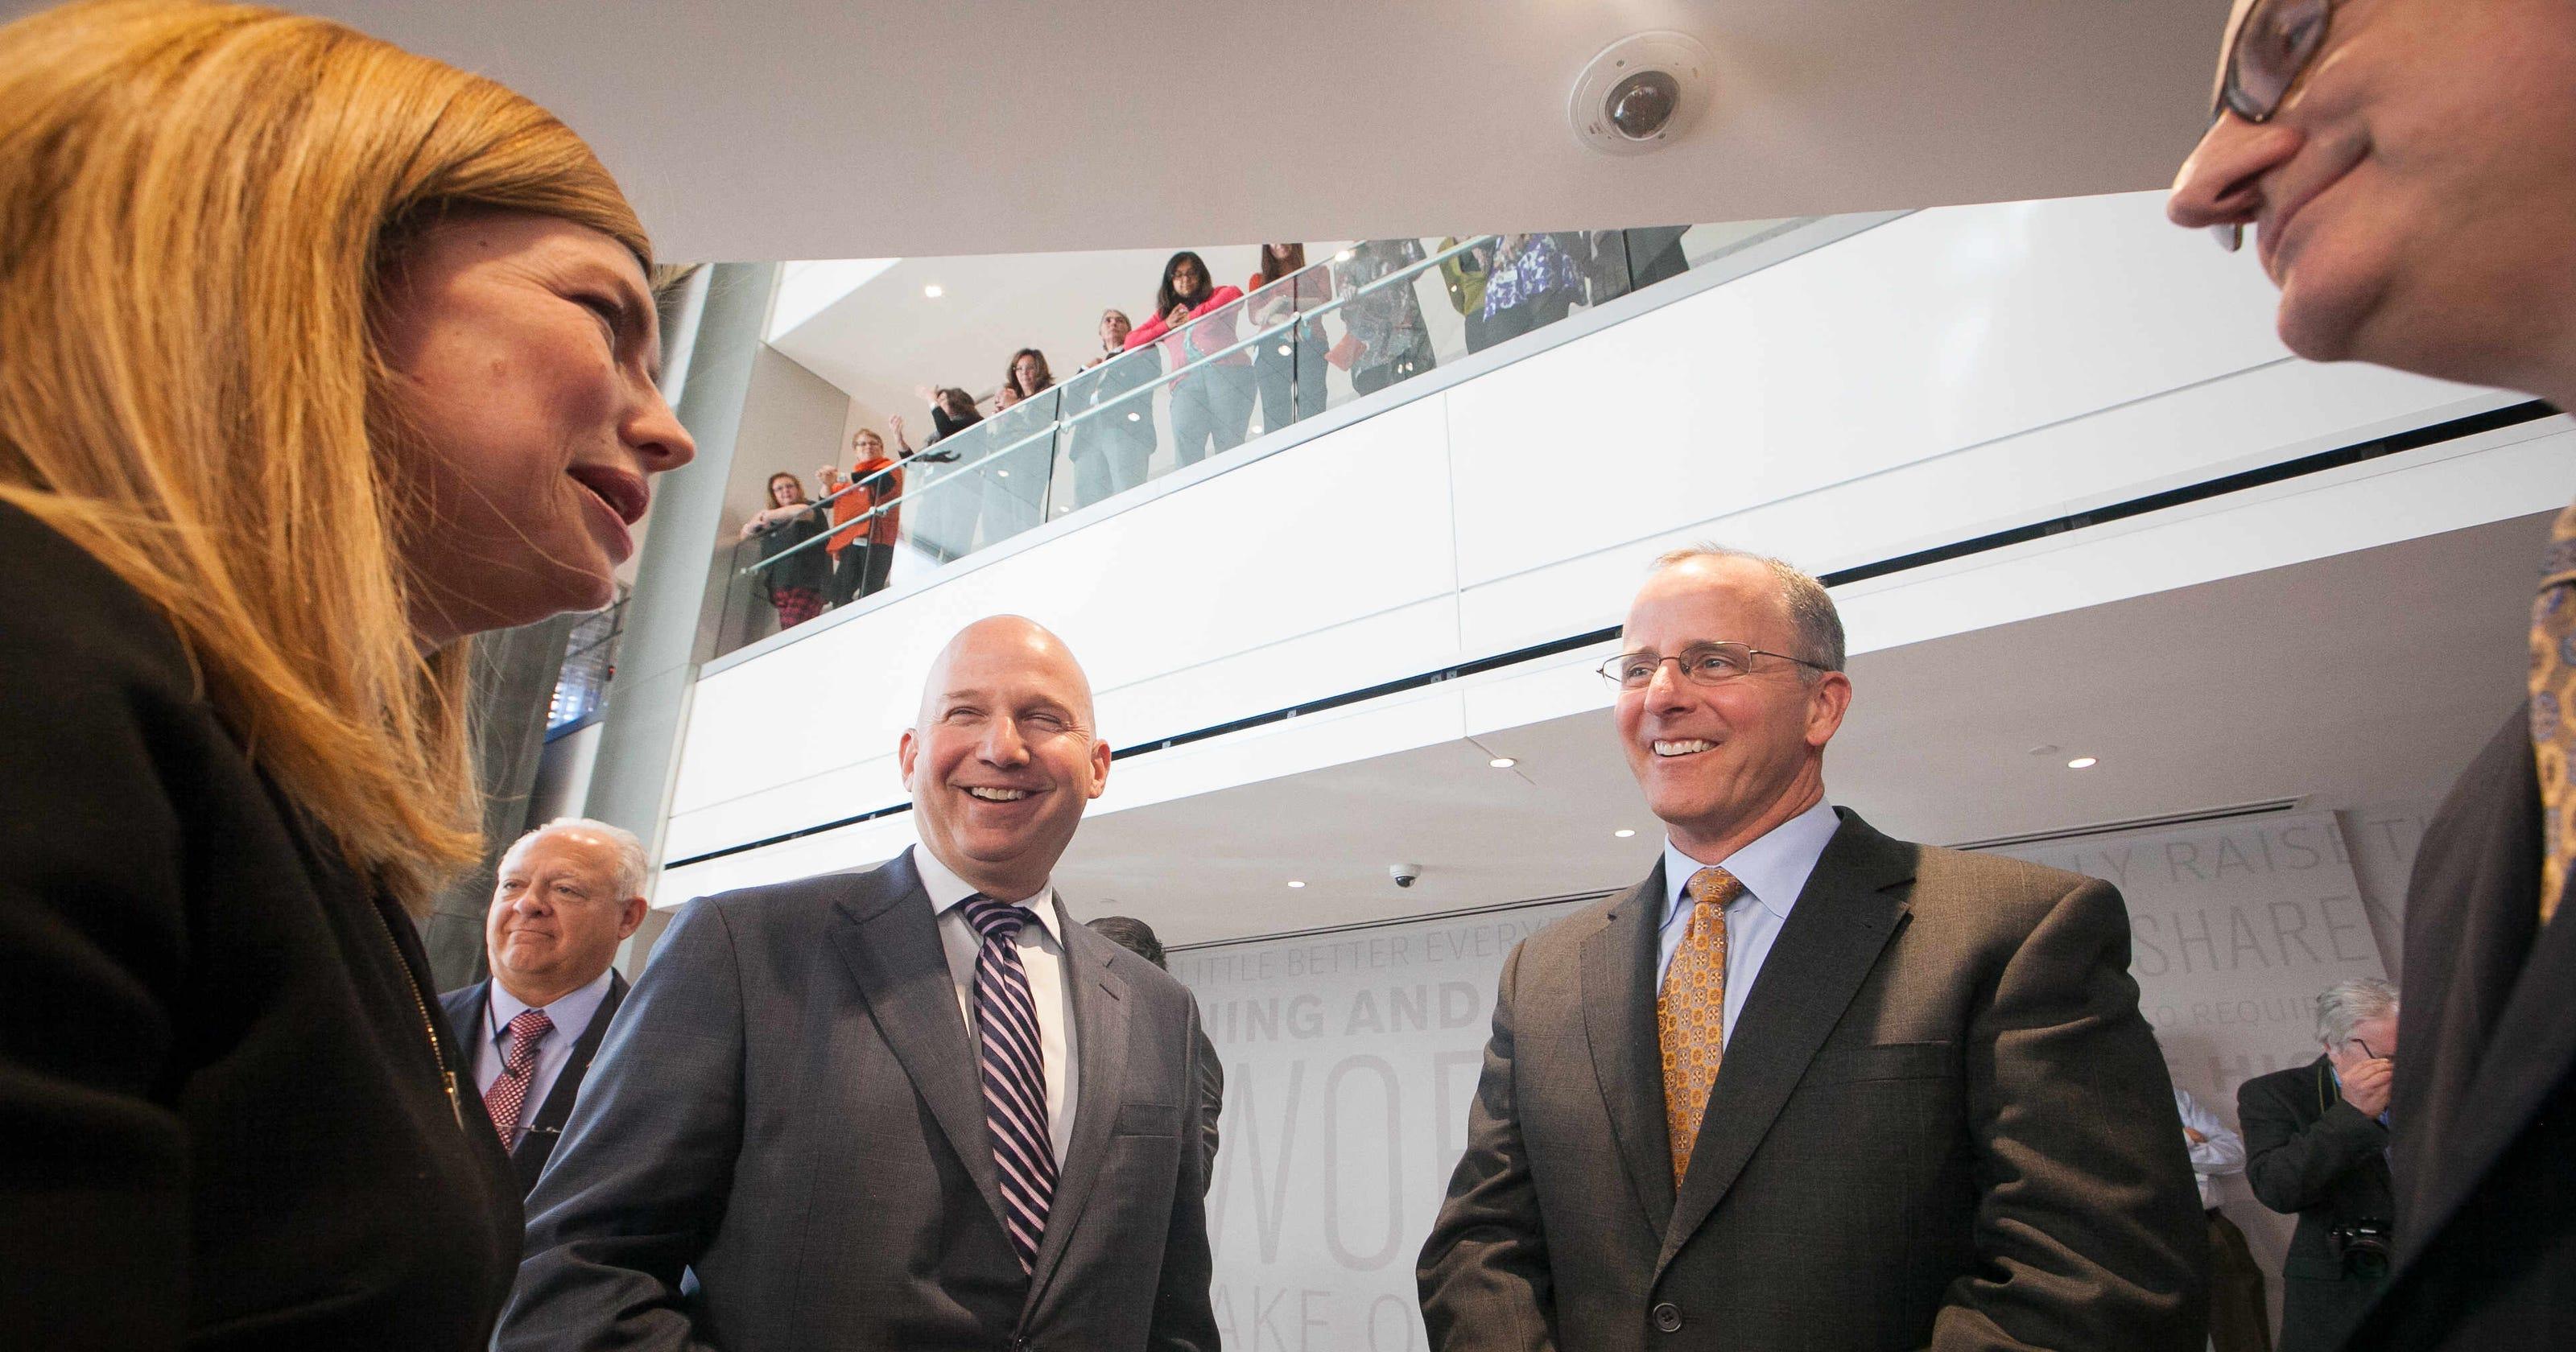 JPMorgan Chase adding 1,800 jobs